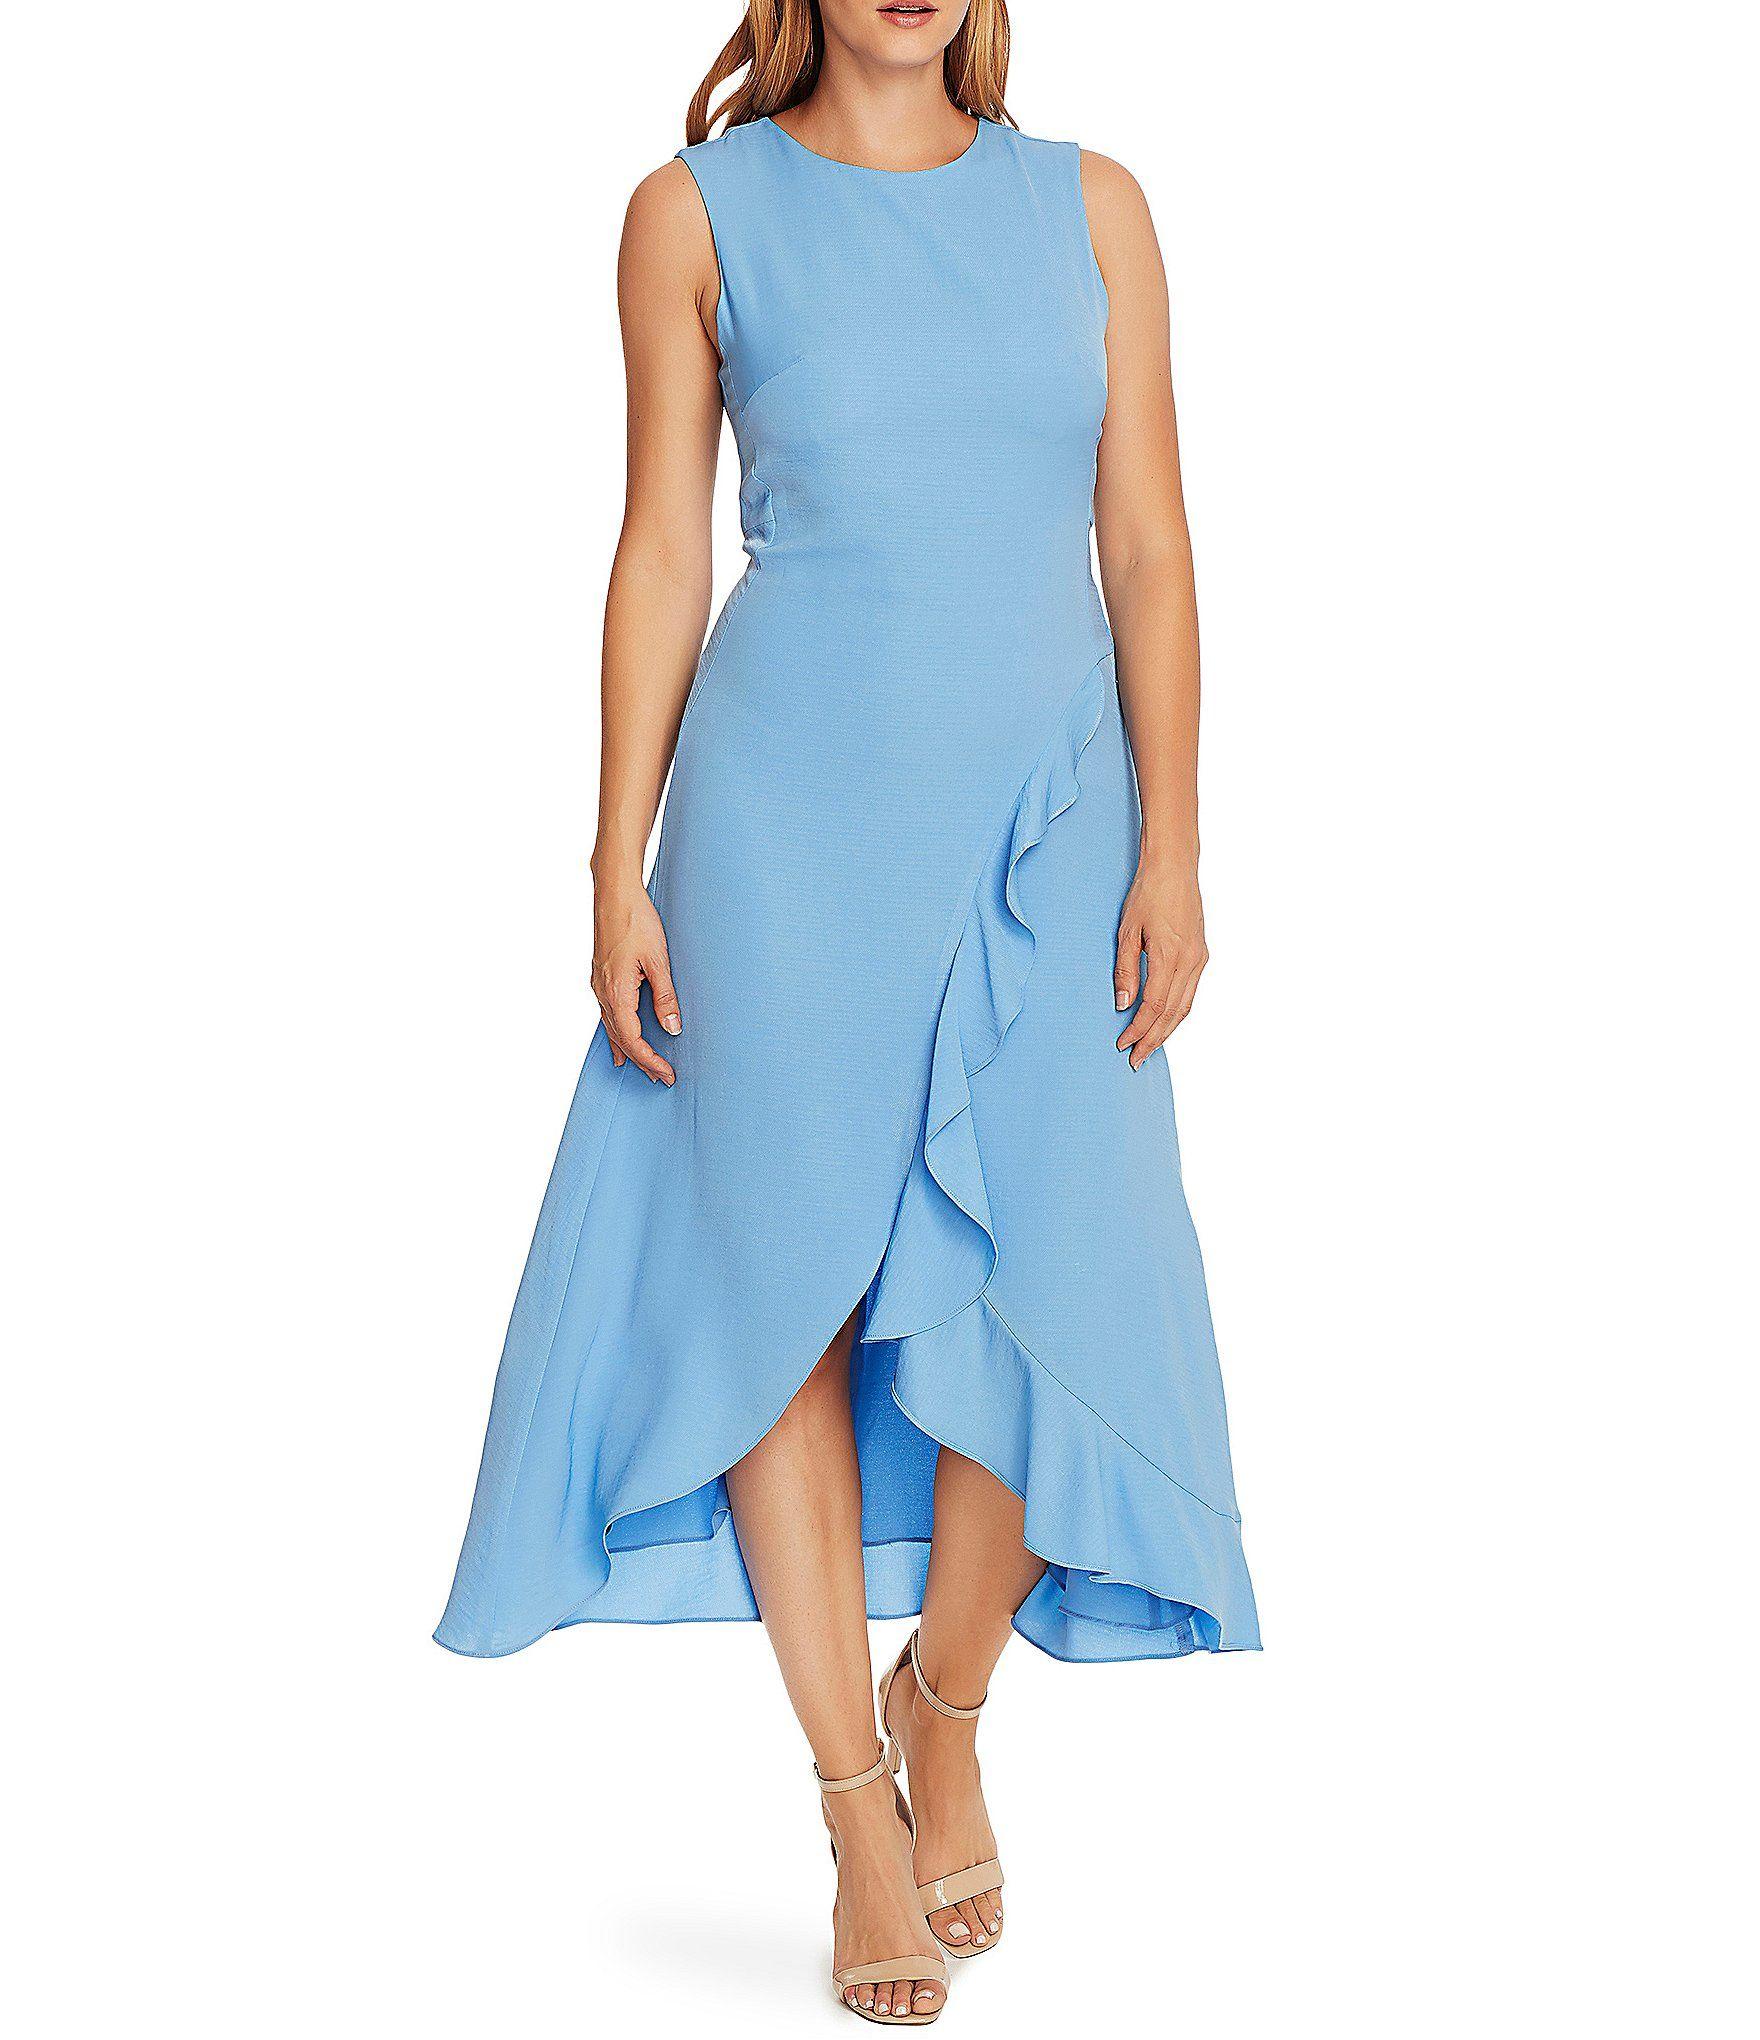 Shop For Vince Camuto Sleeveless Ruffled Asymmetrical Midi Dress At Dillard S Visit Dillard S To Find Clot Ruffled Dress Women Dresses Asymmetrical Midi Dress [ 2040 x 1760 Pixel ]